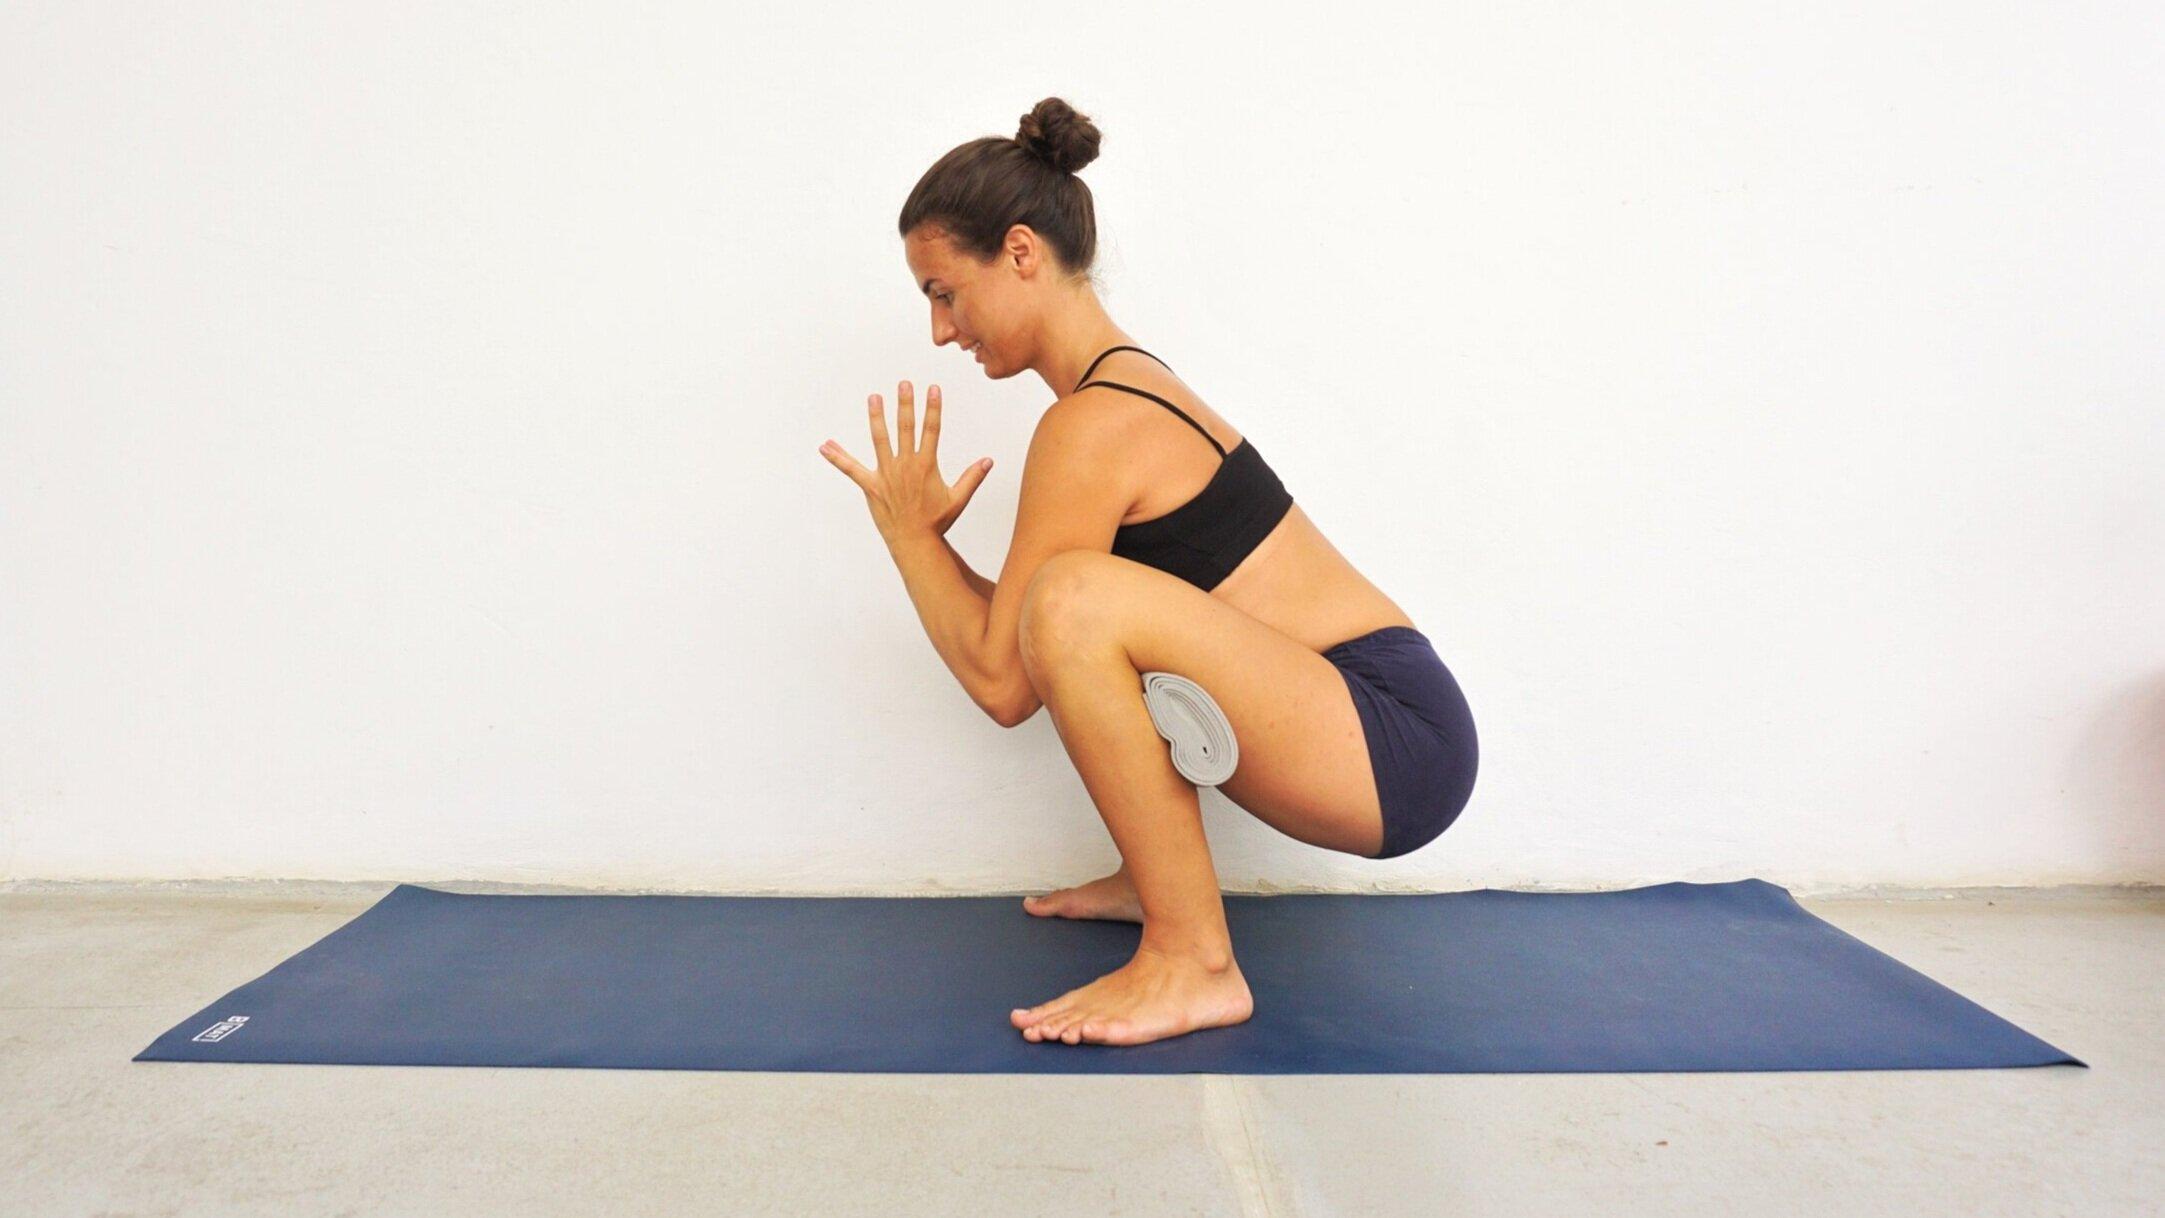 Byoga Mat Review Traveller Mat Yoga Alignment Guide